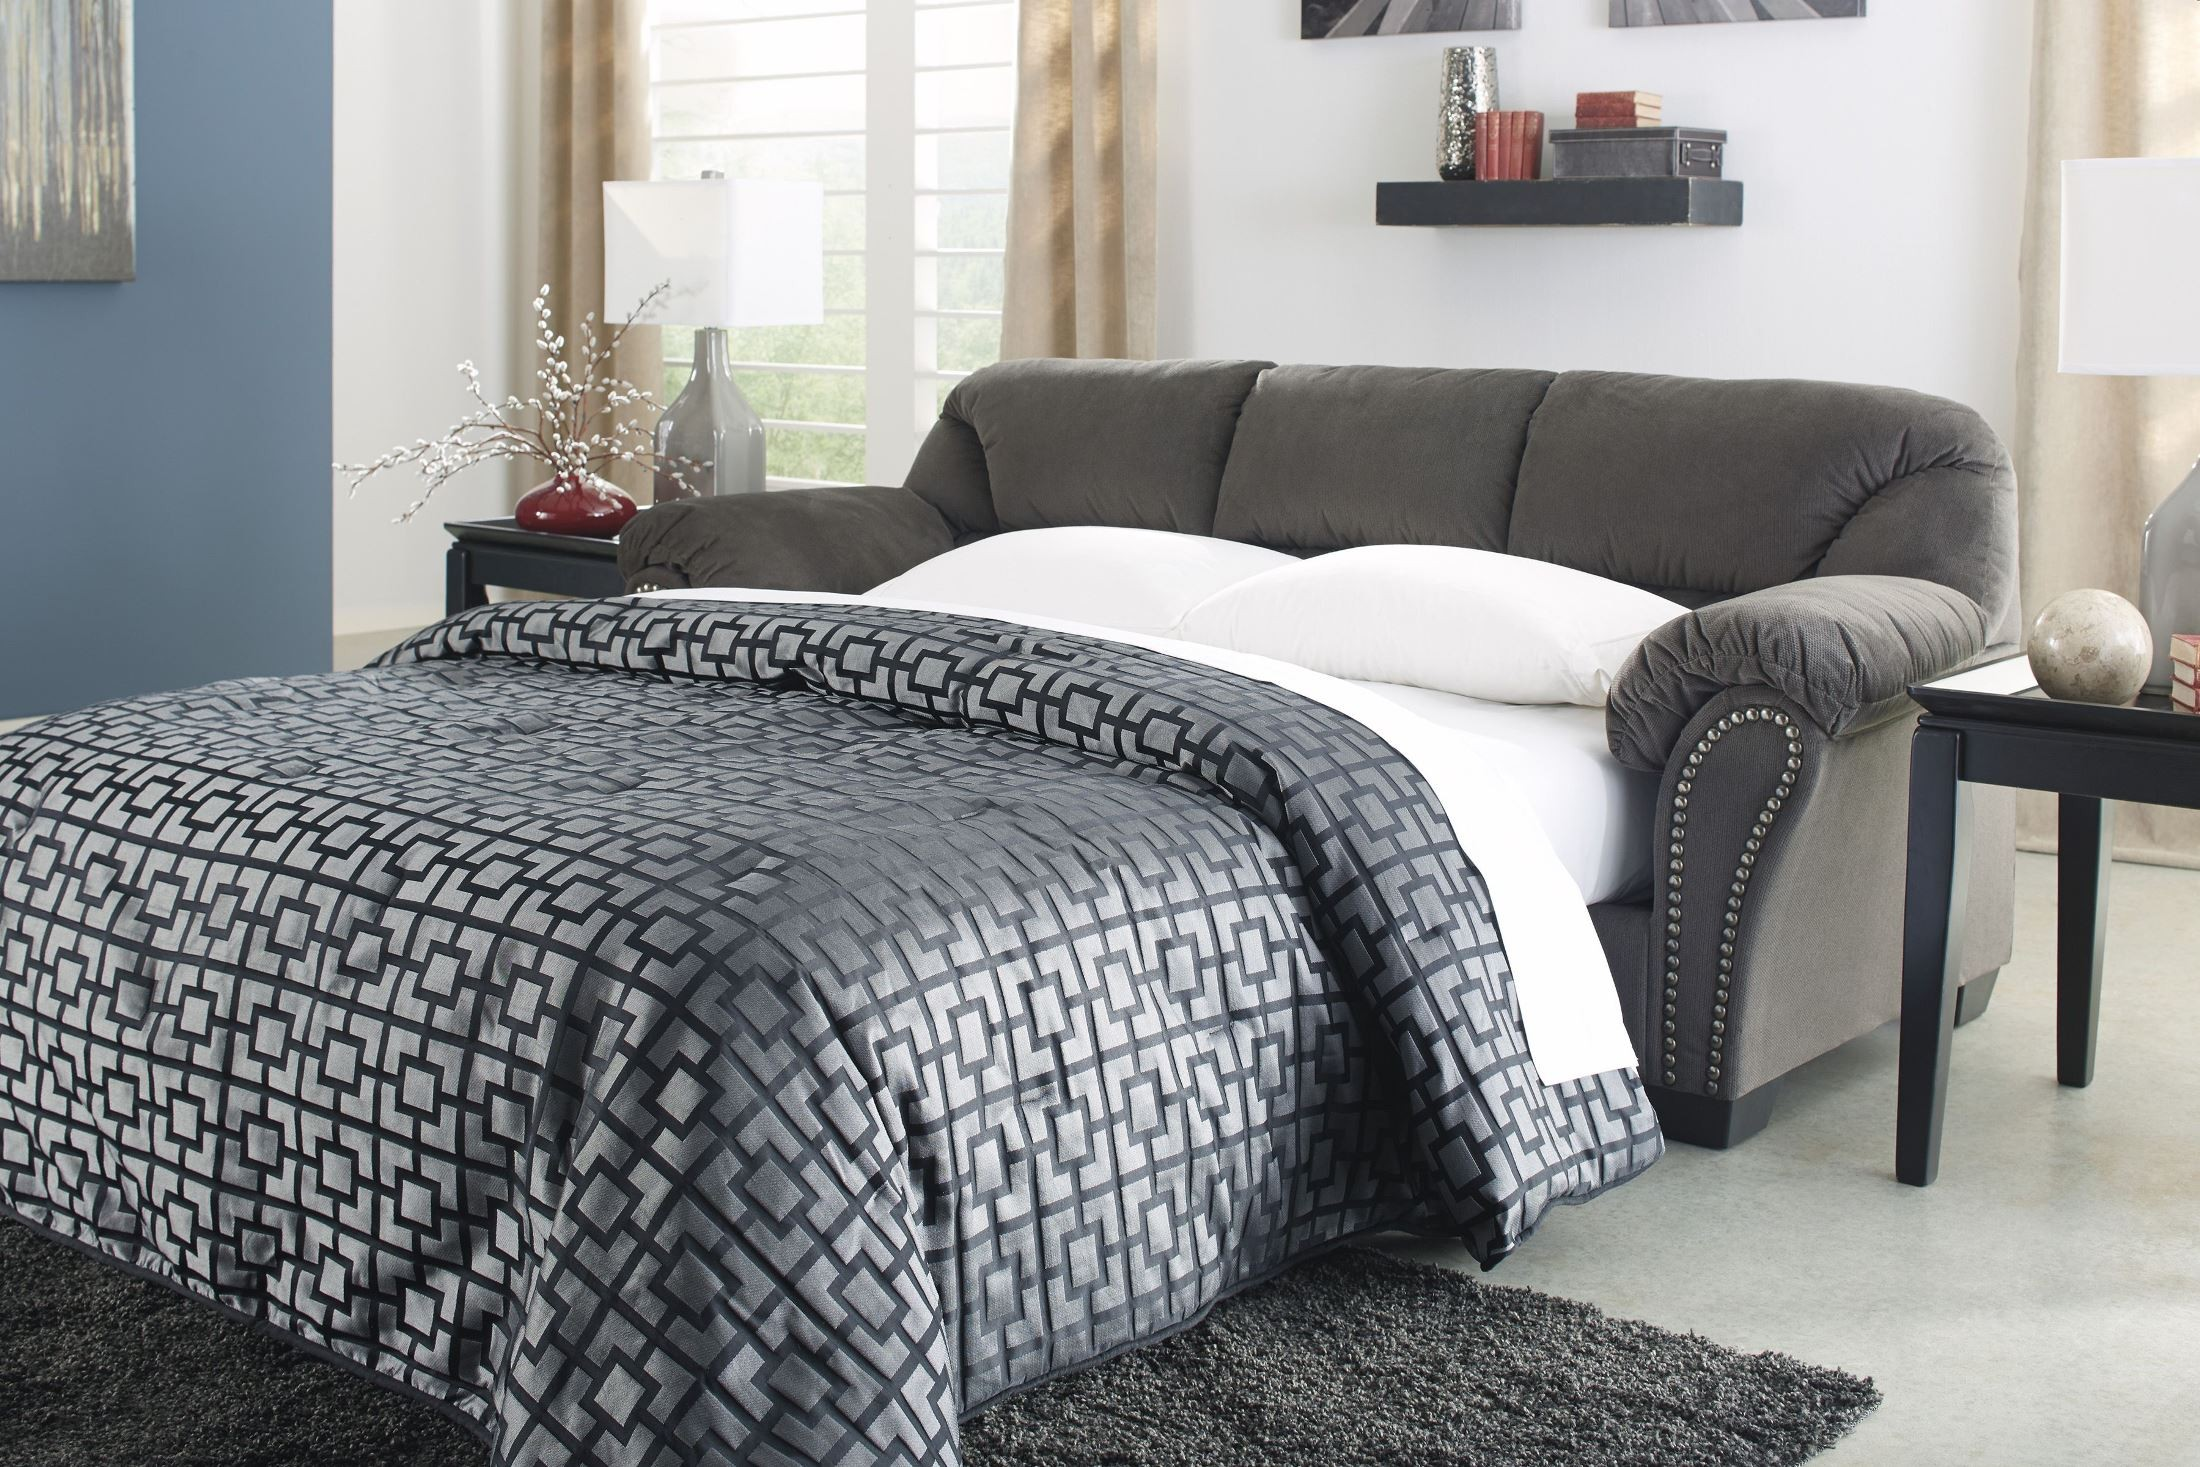 Kinlock Charcoal Full Sofa Sleeper From Ashley 3340036